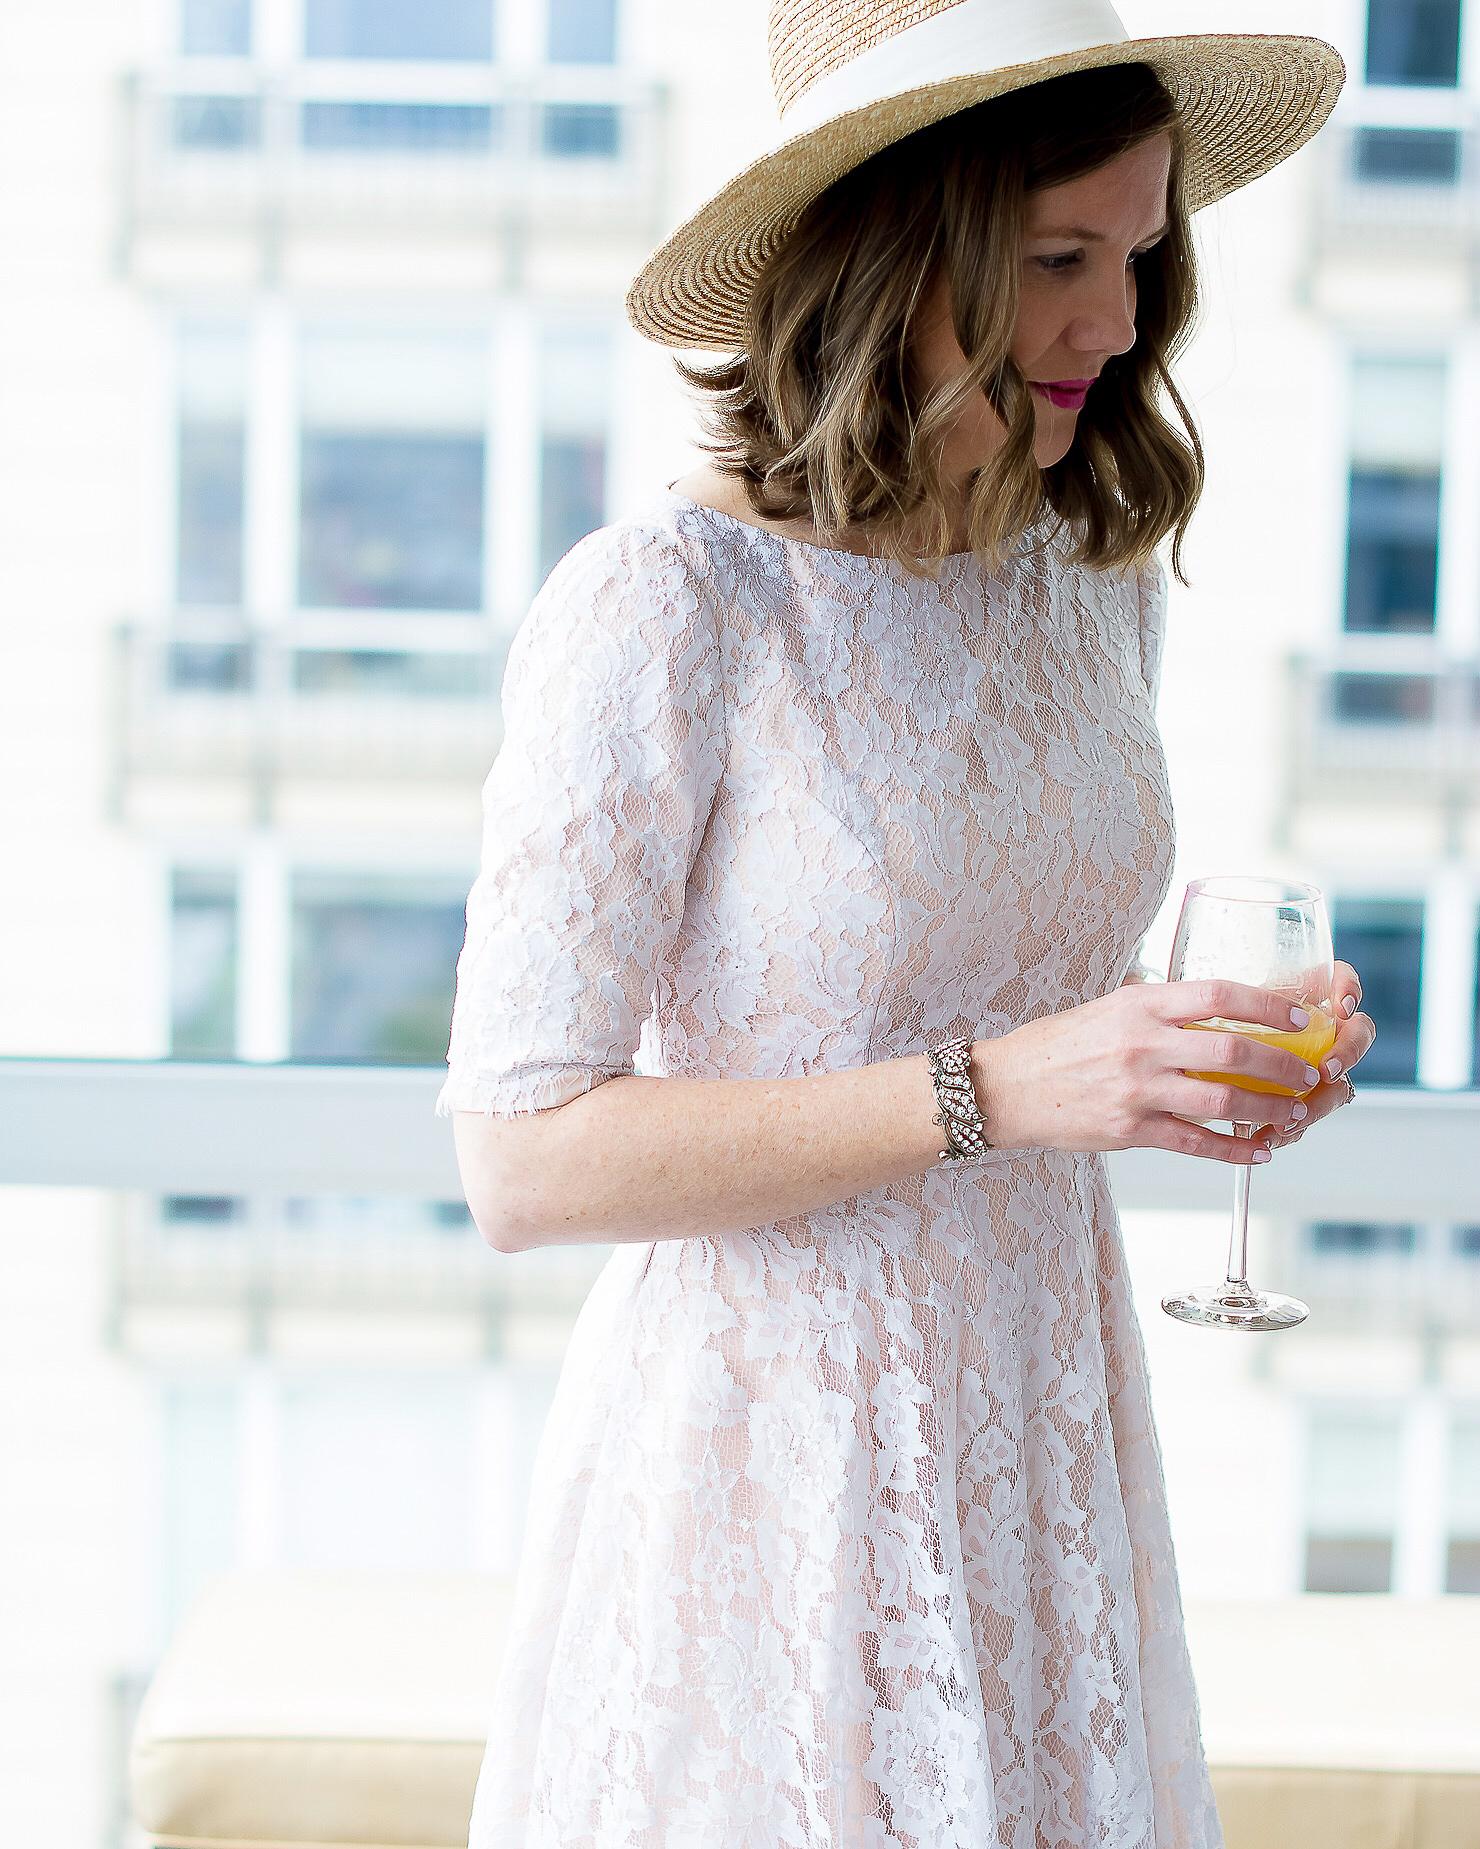 kentucky-derby-dress-ml-mounique-lhuillier-white-lace-dress